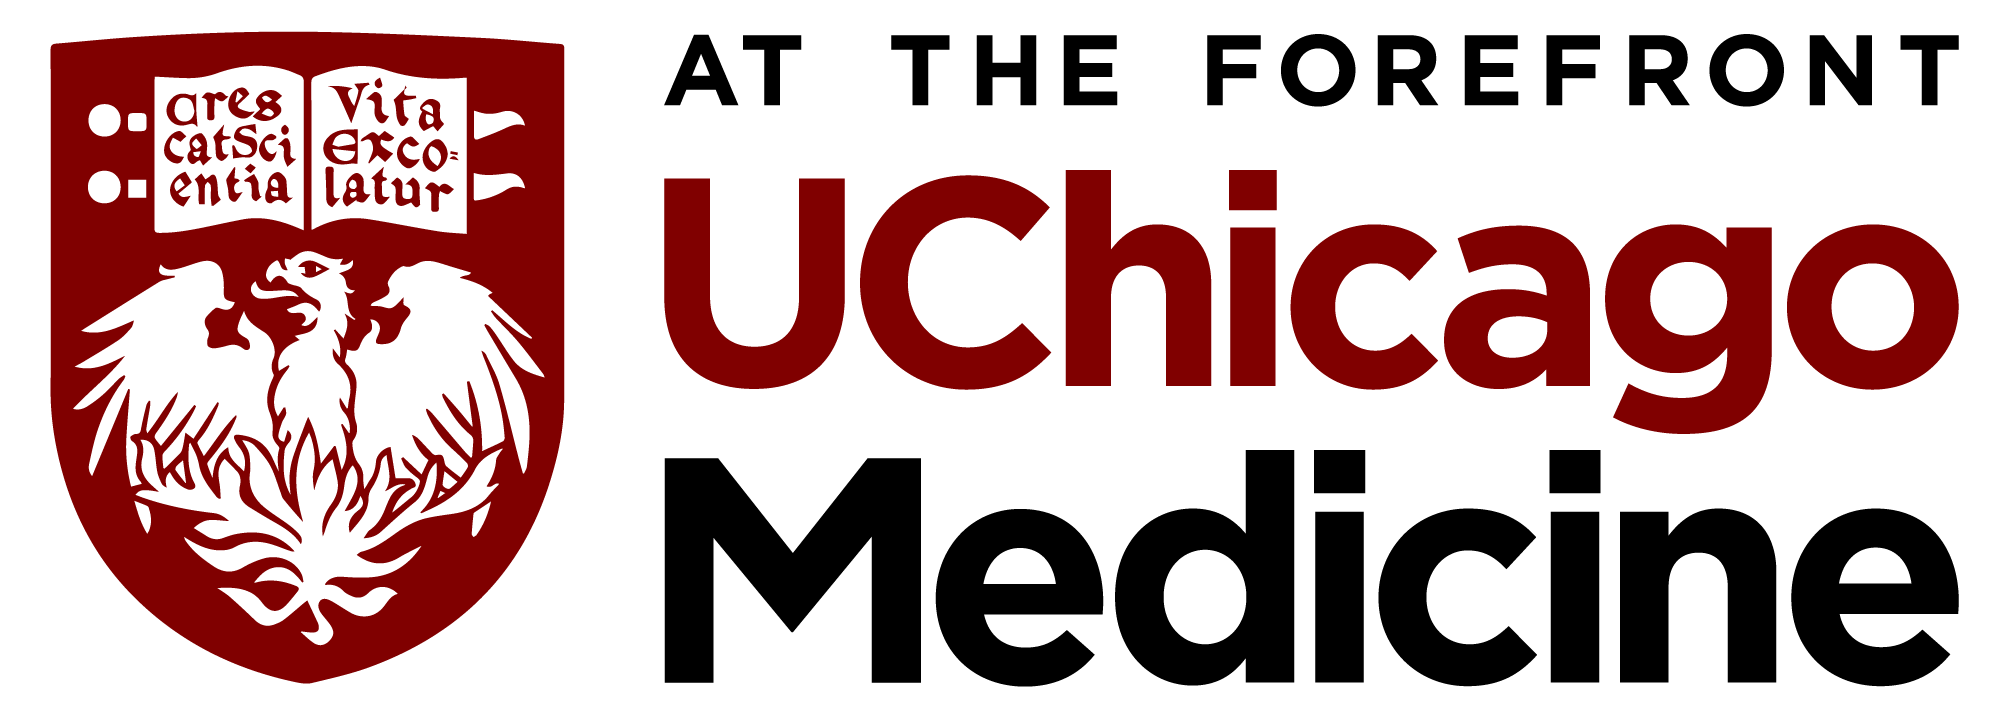 UCM_Logo_Master_Brand_Tagline_full_color_rgb.png